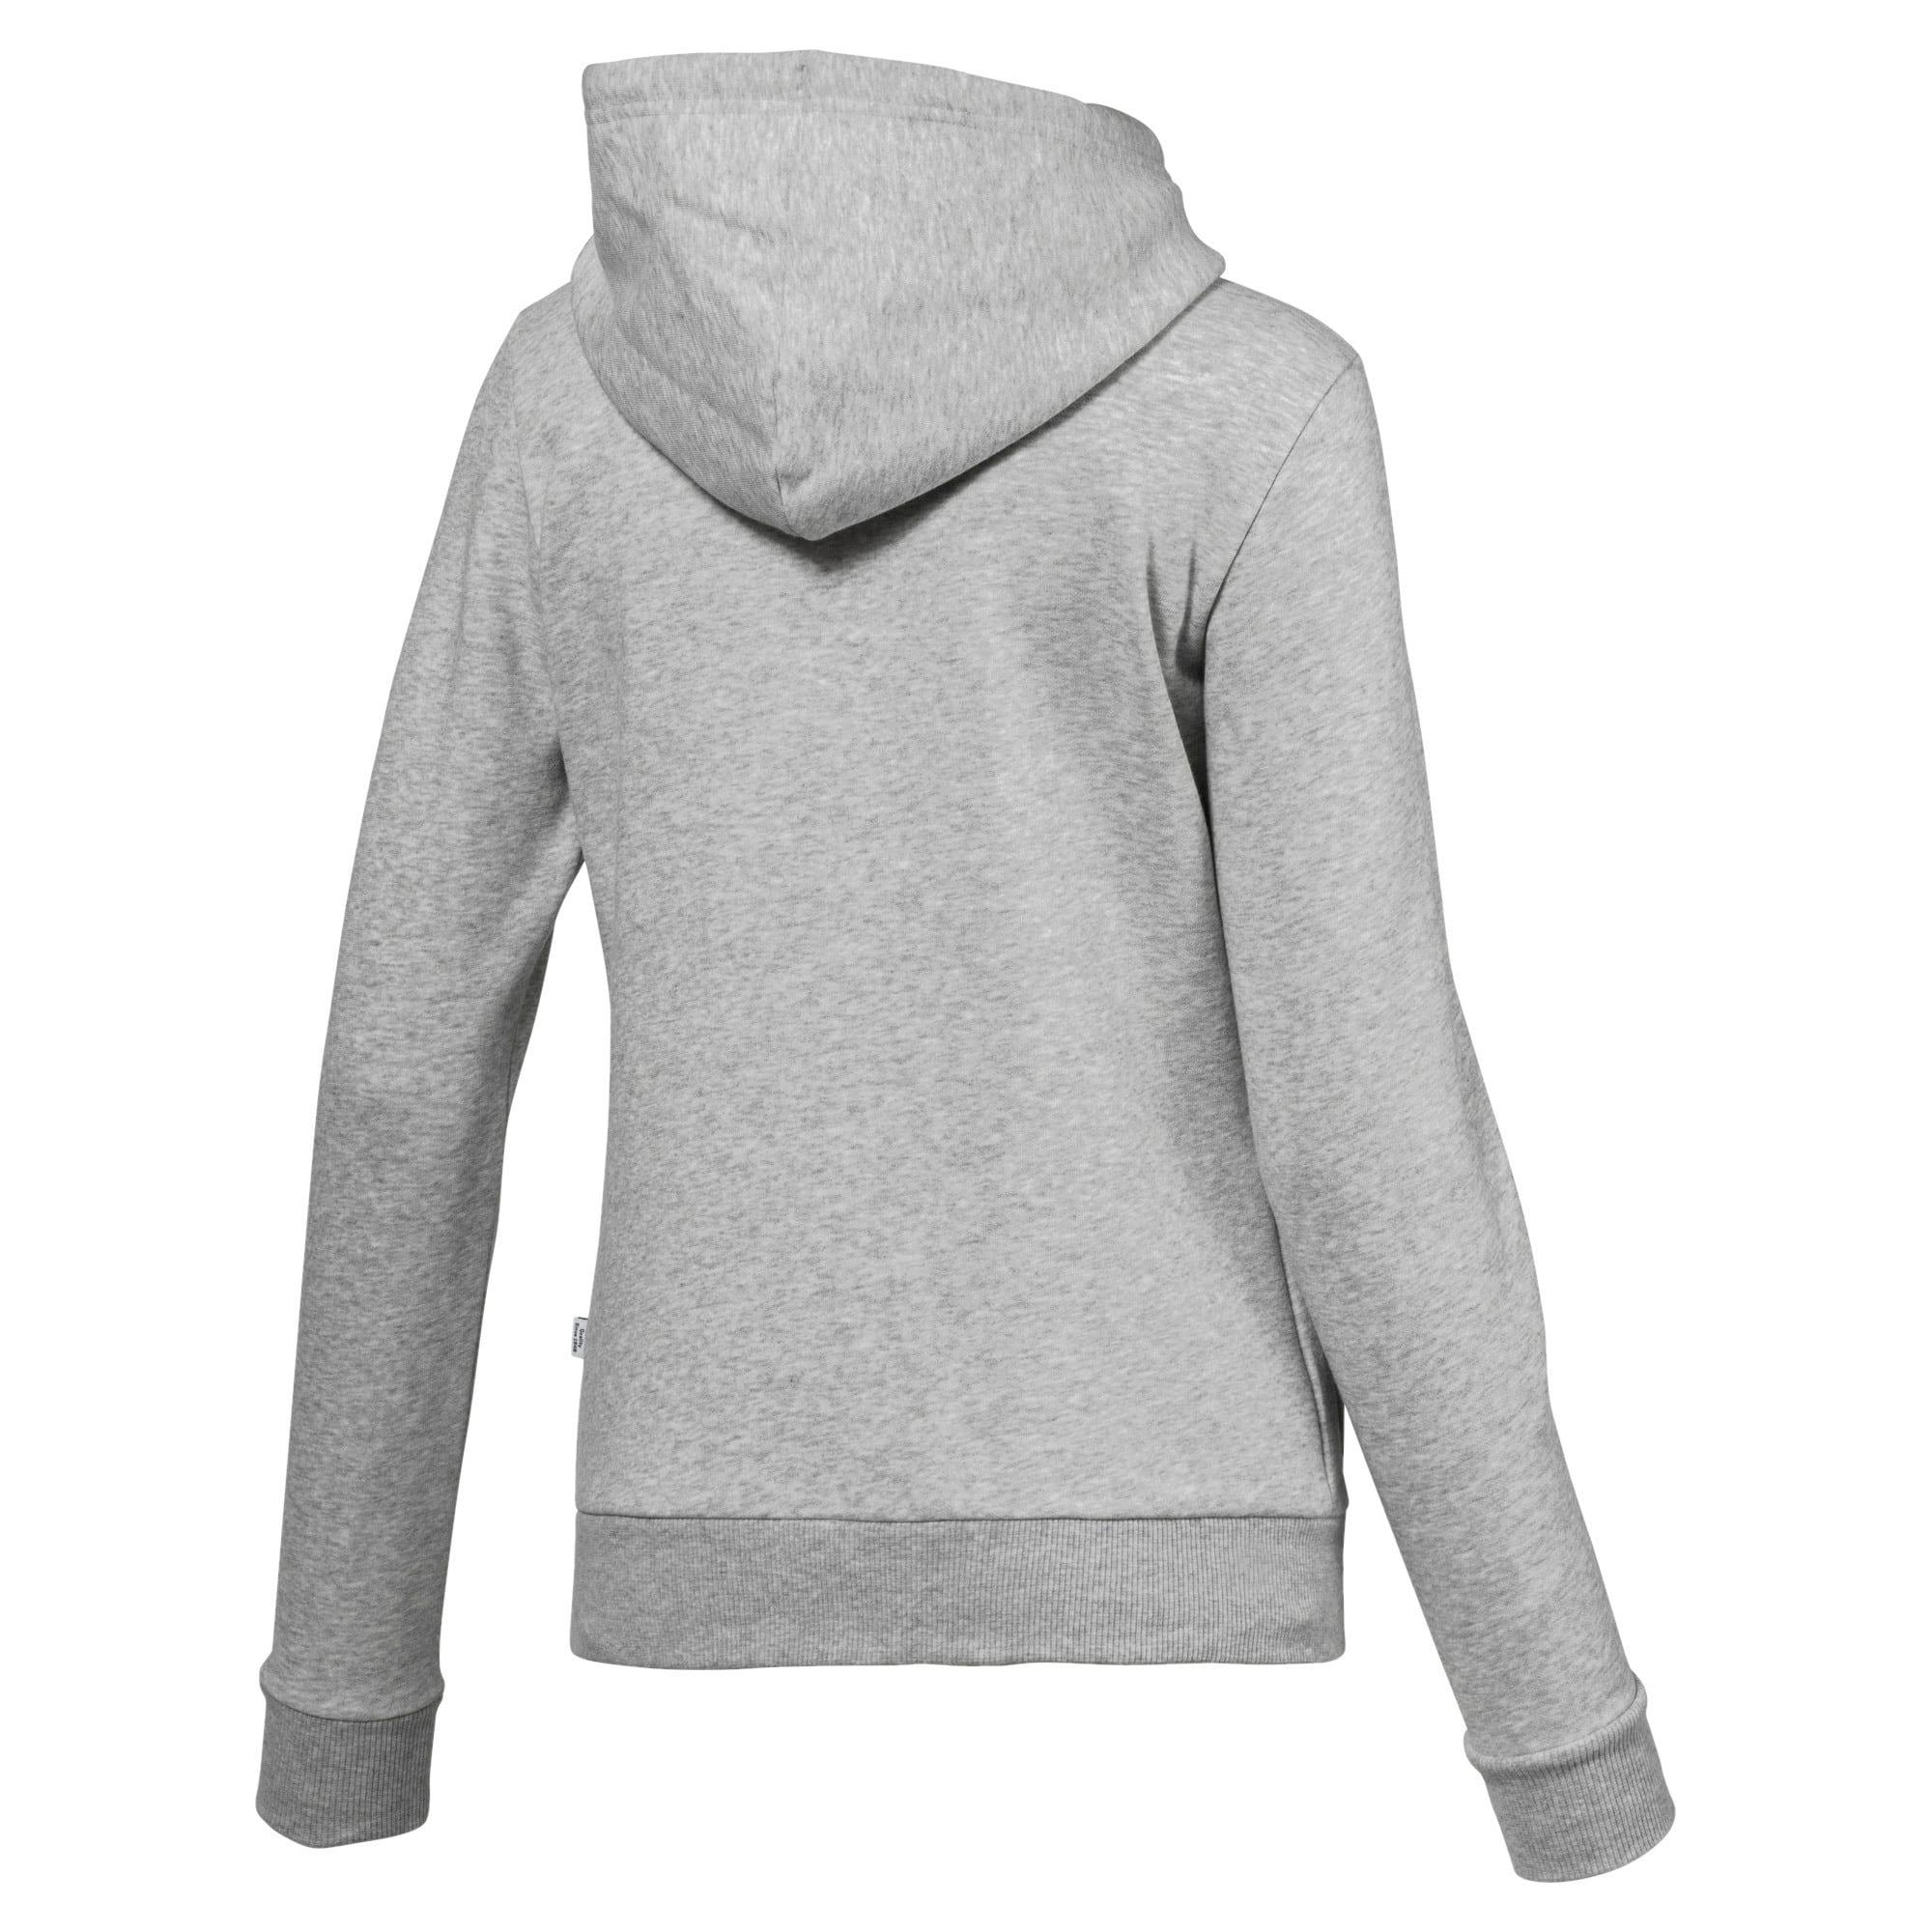 Thumbnail 5 of Essentials Fleece Women's Hoodie, Light Gray Heather, medium